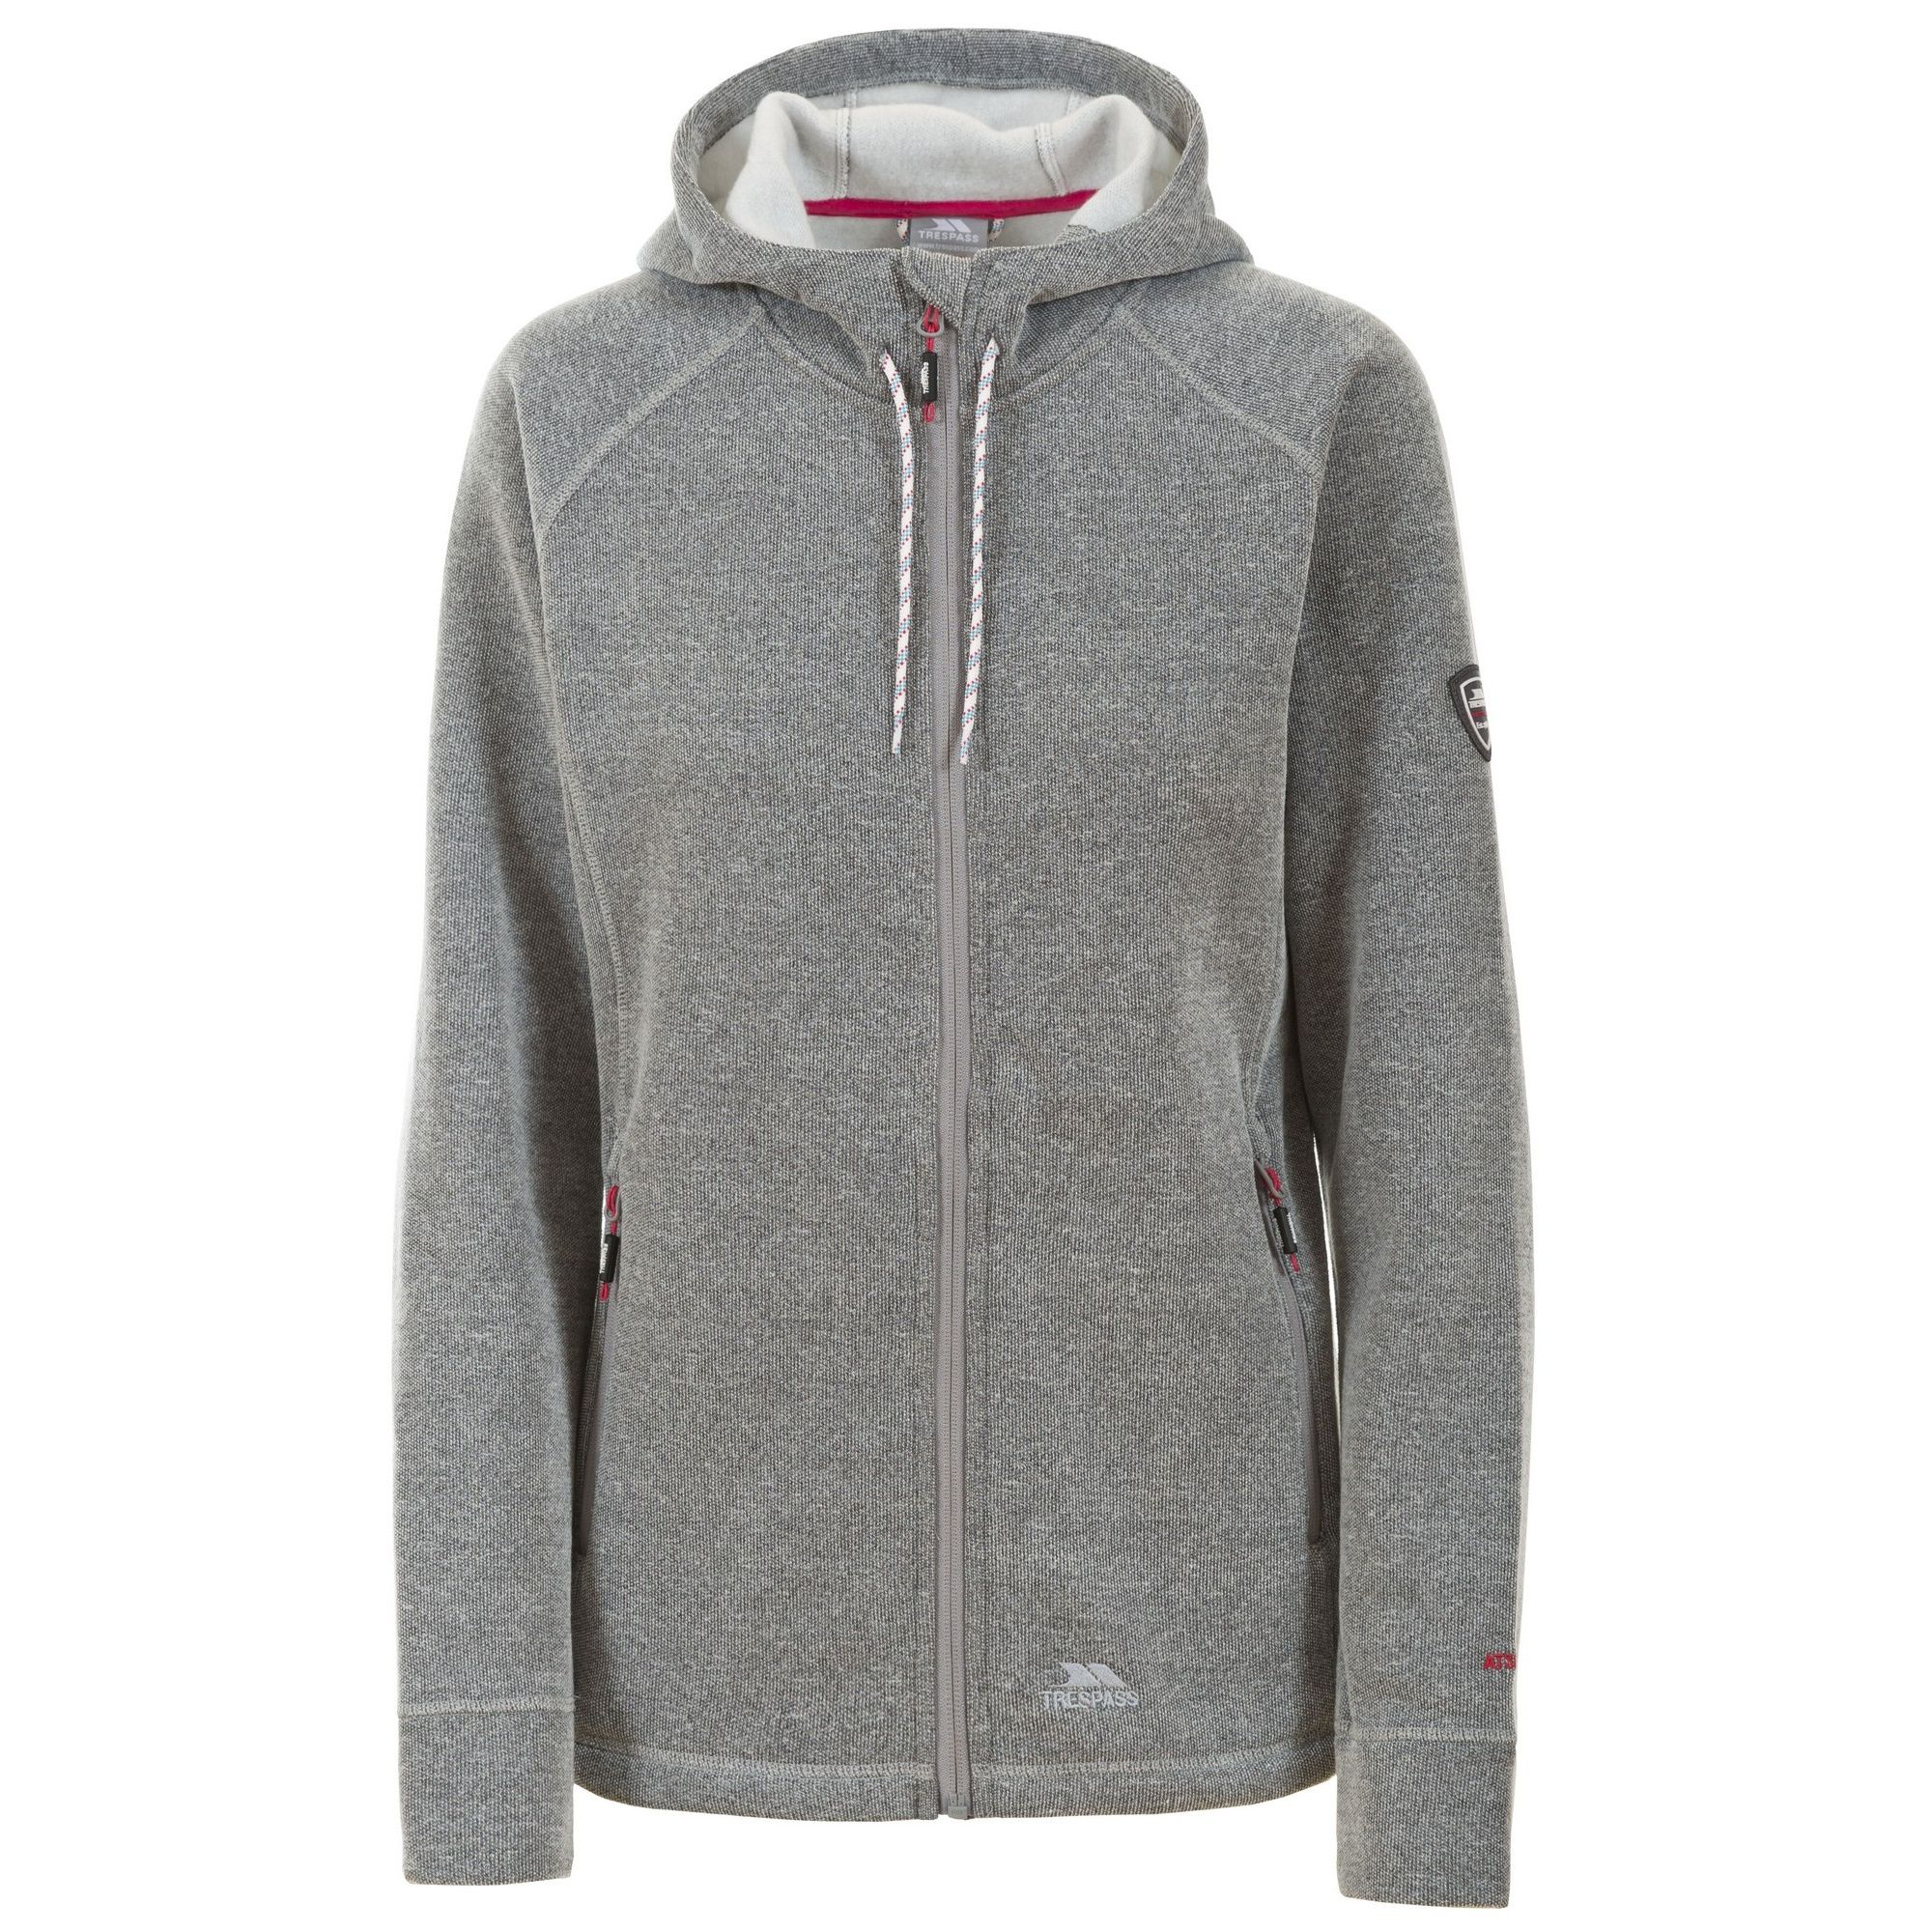 Trespass Womens/Ladies Whirlwind Full Zip Hooded Fleece Jacket